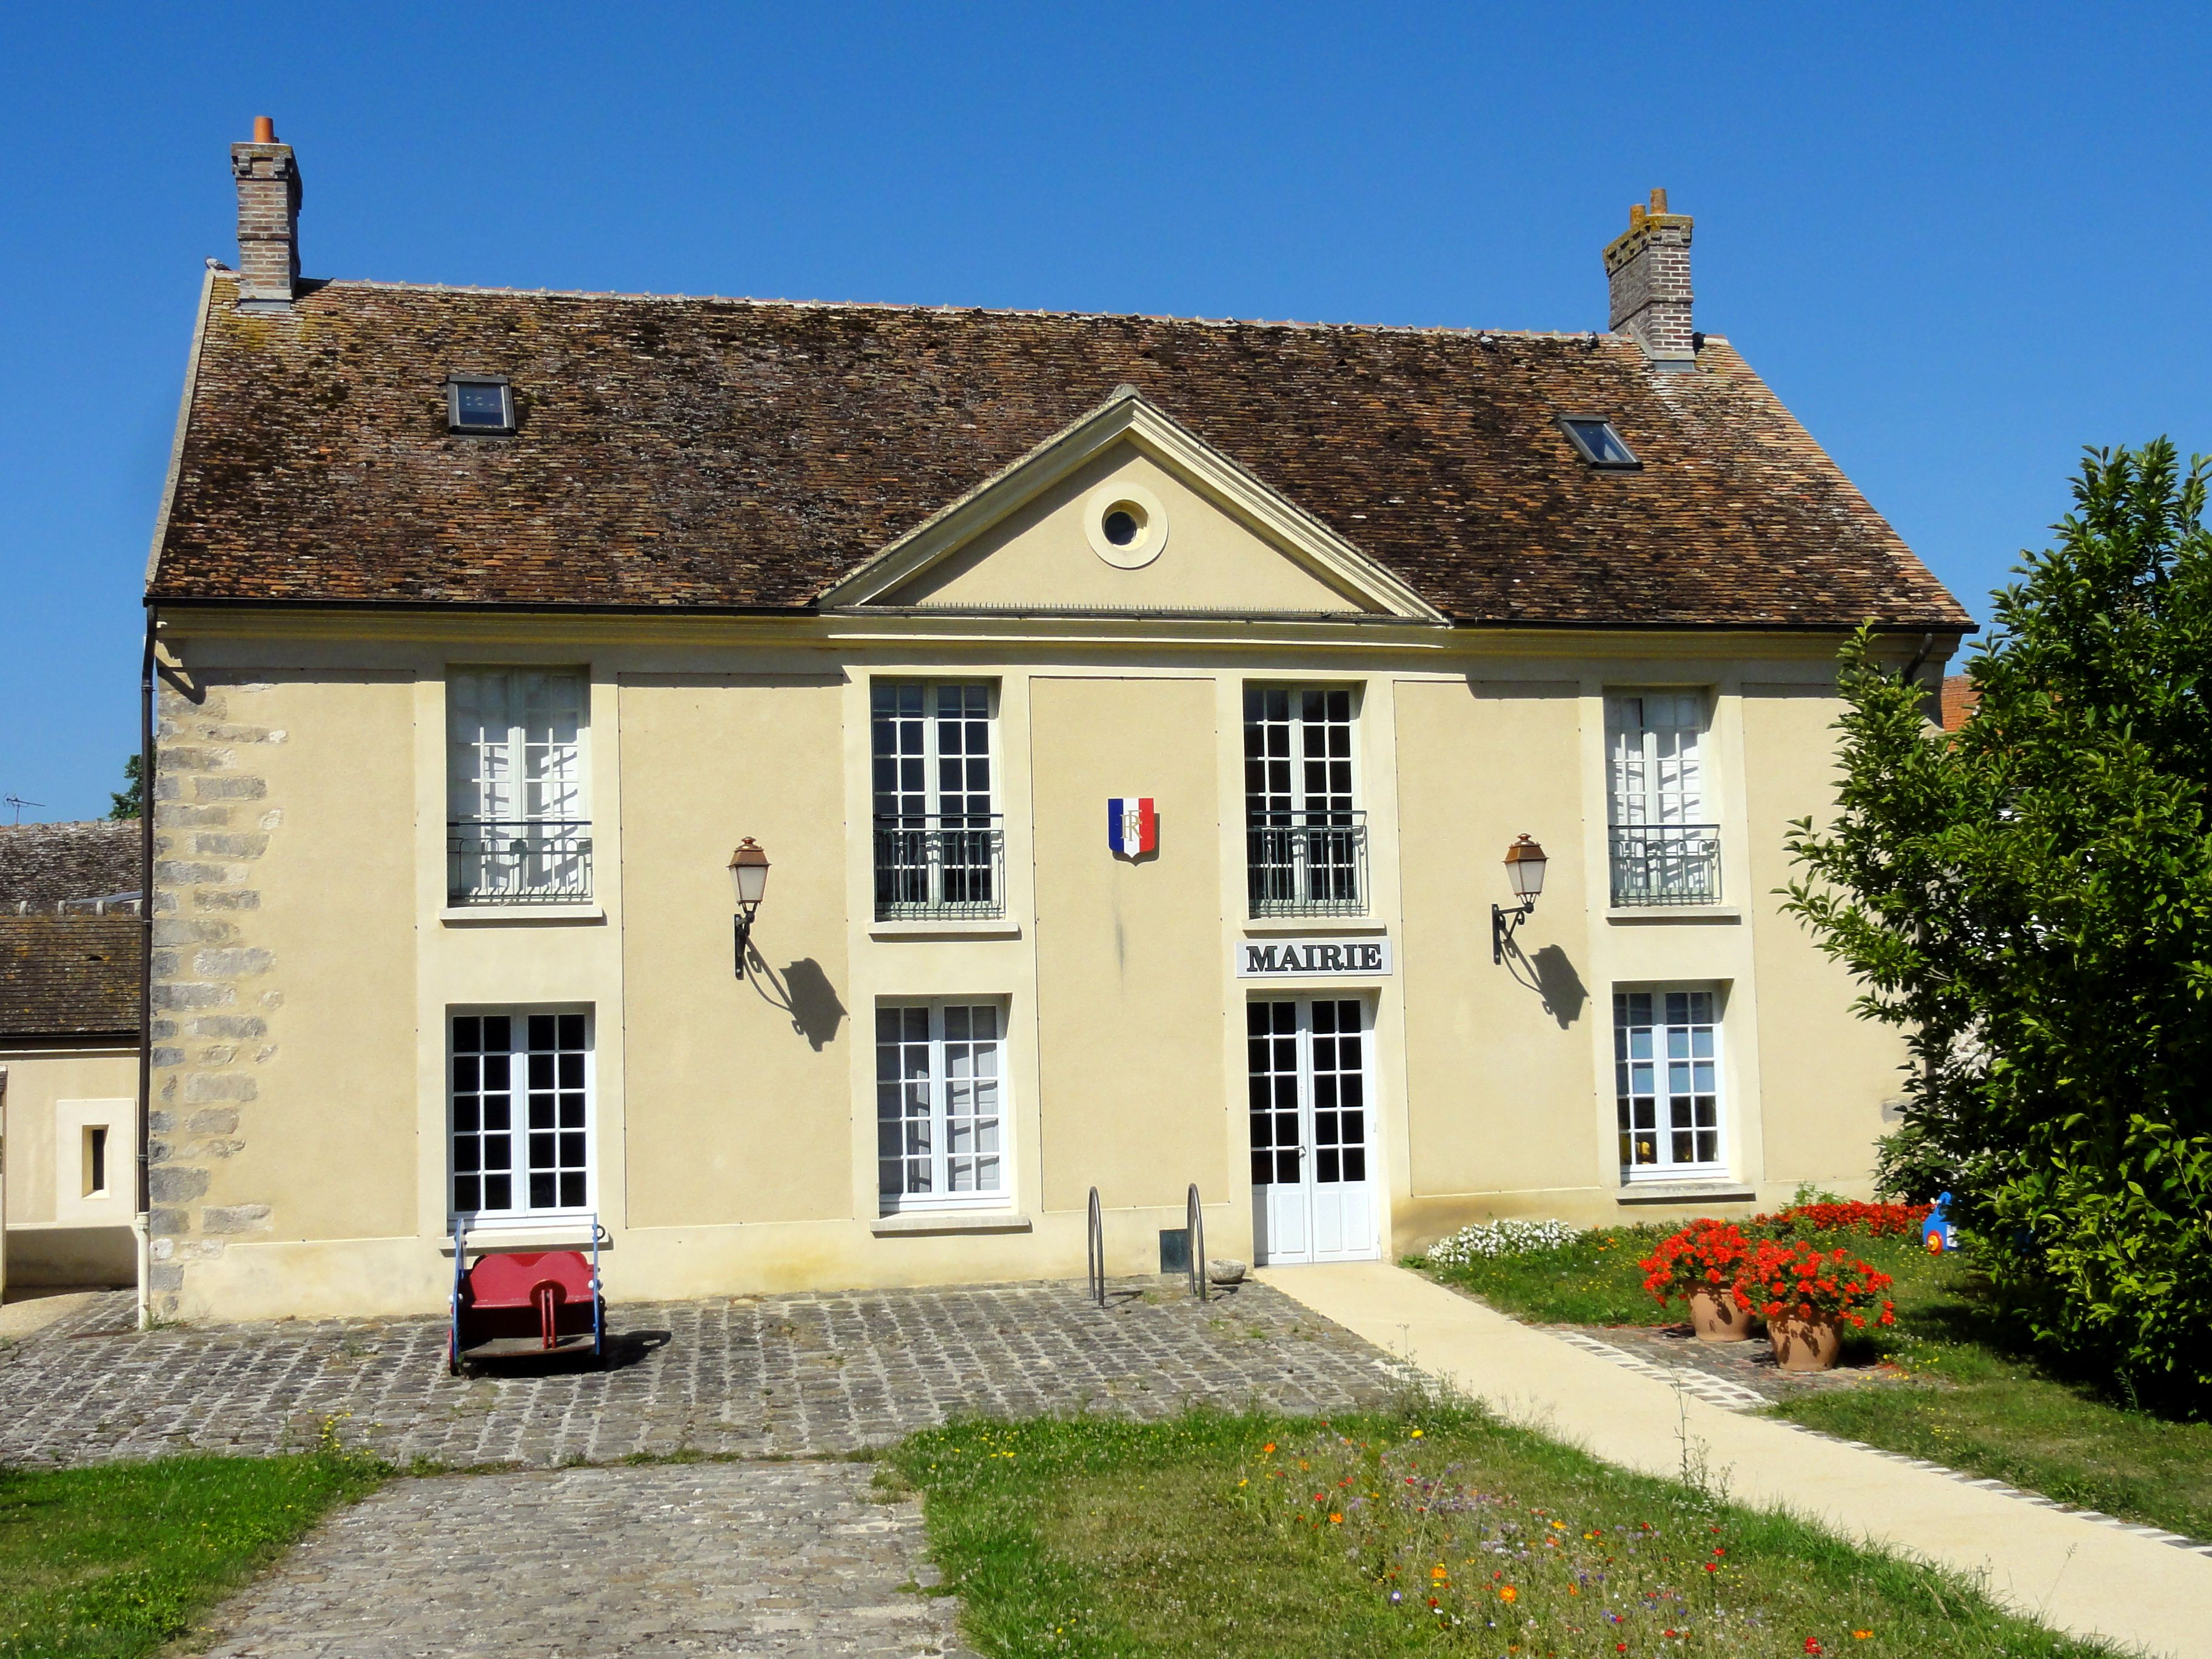 Champeaux (Sena e Marne)